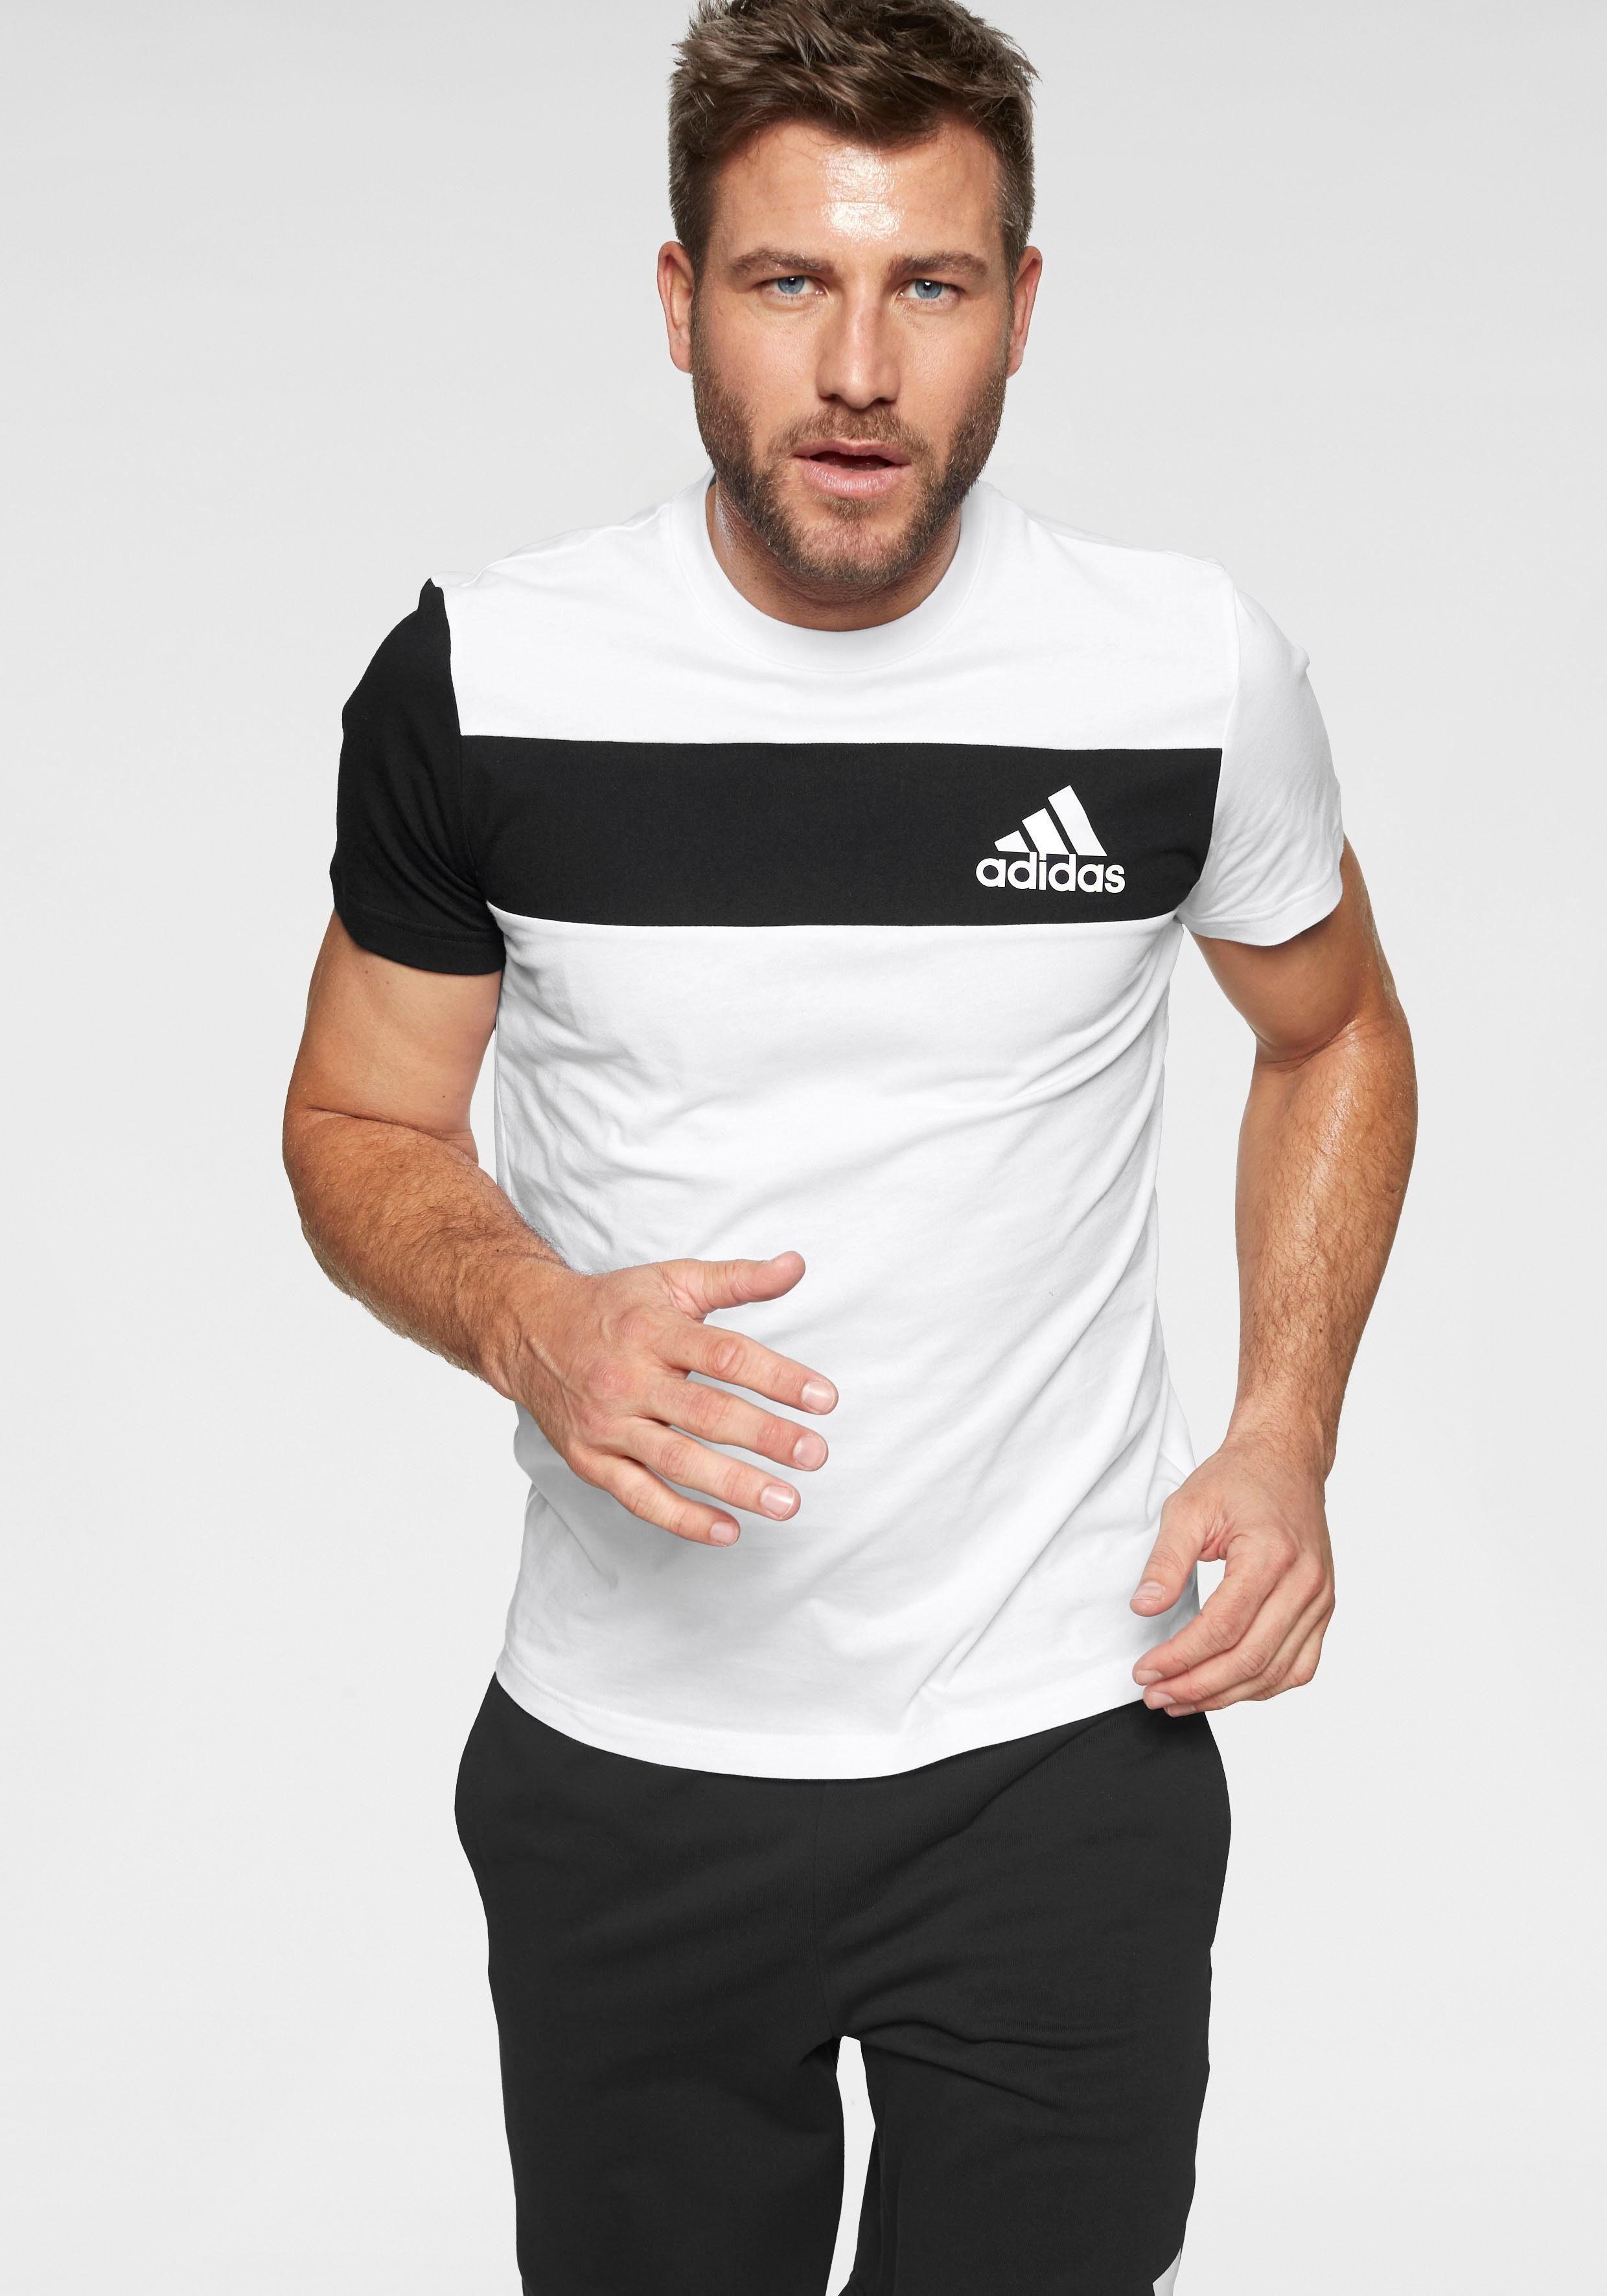 Adidas Response Long Sleeve Tee Men ab 19,99